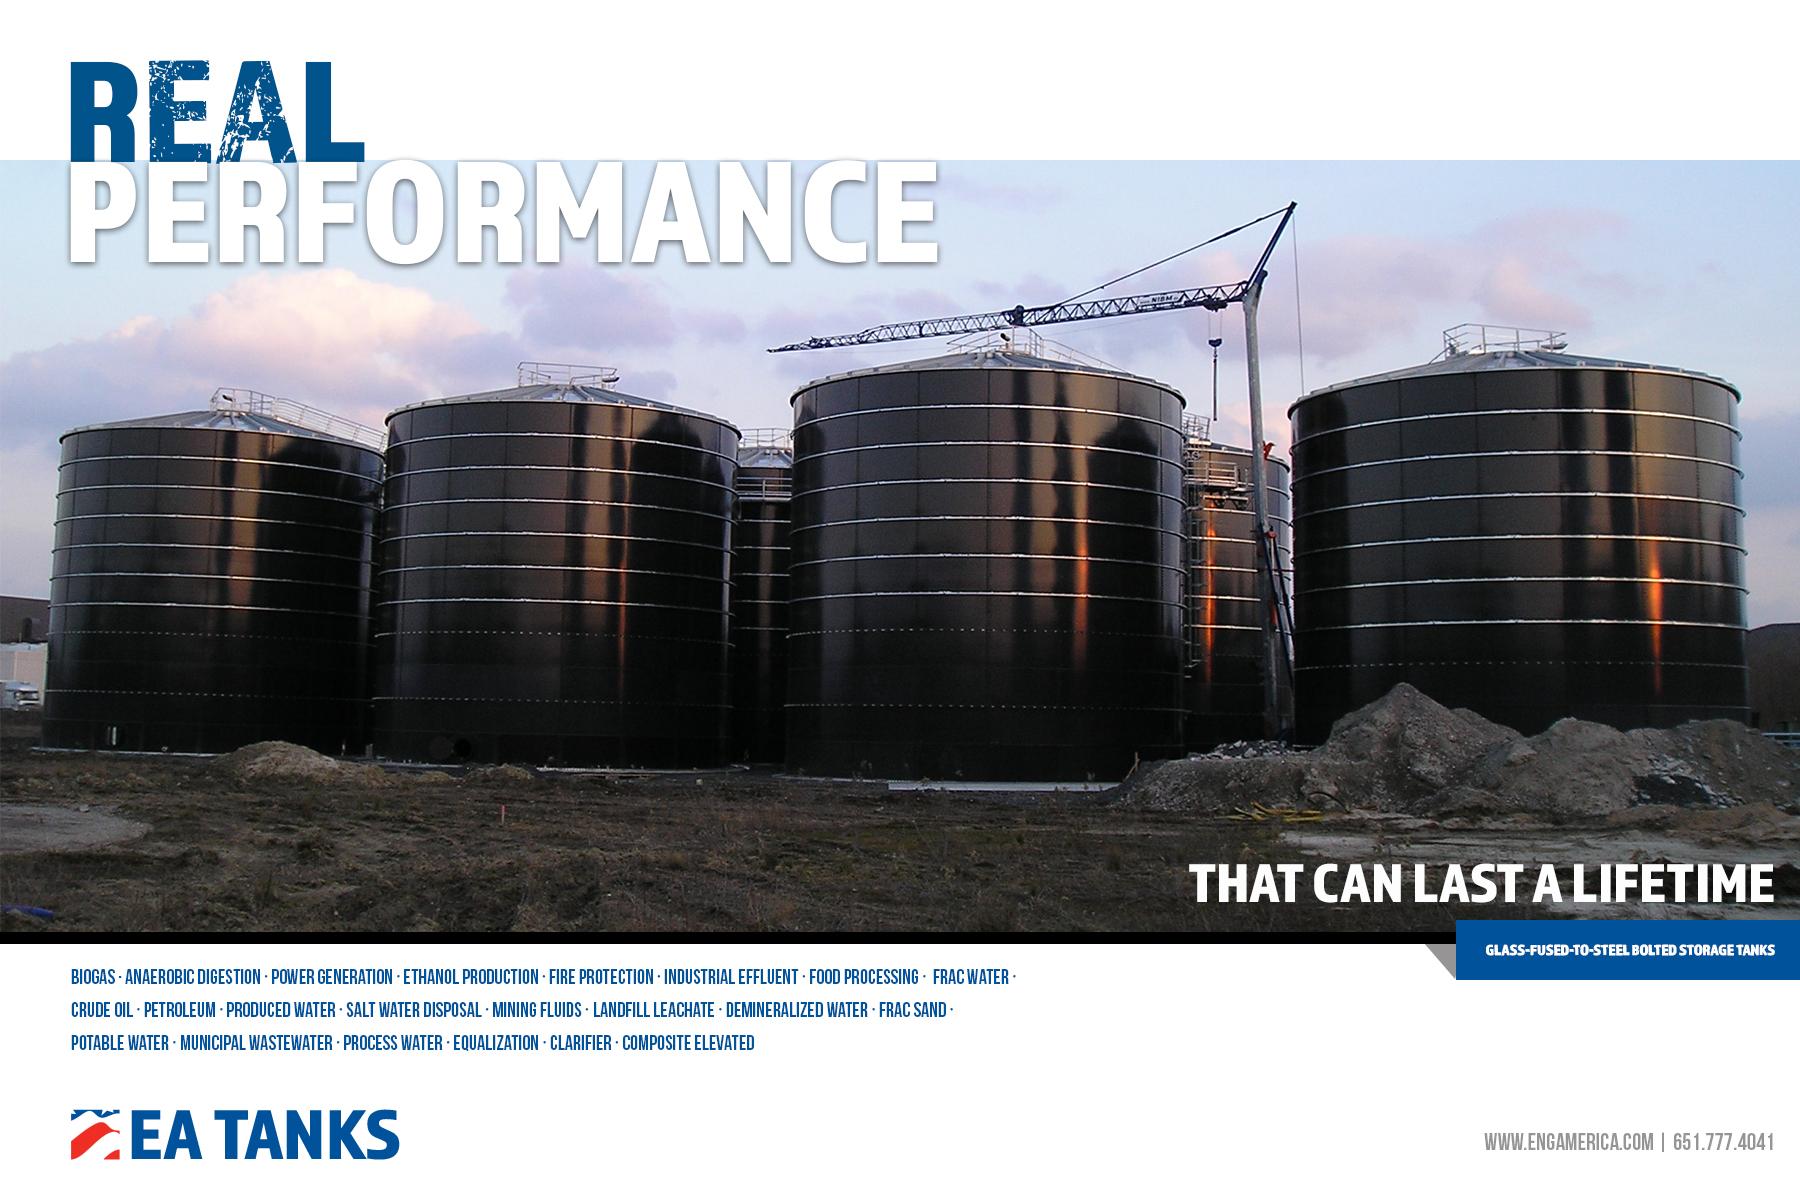 2018 GLASS TANK AD.jpg